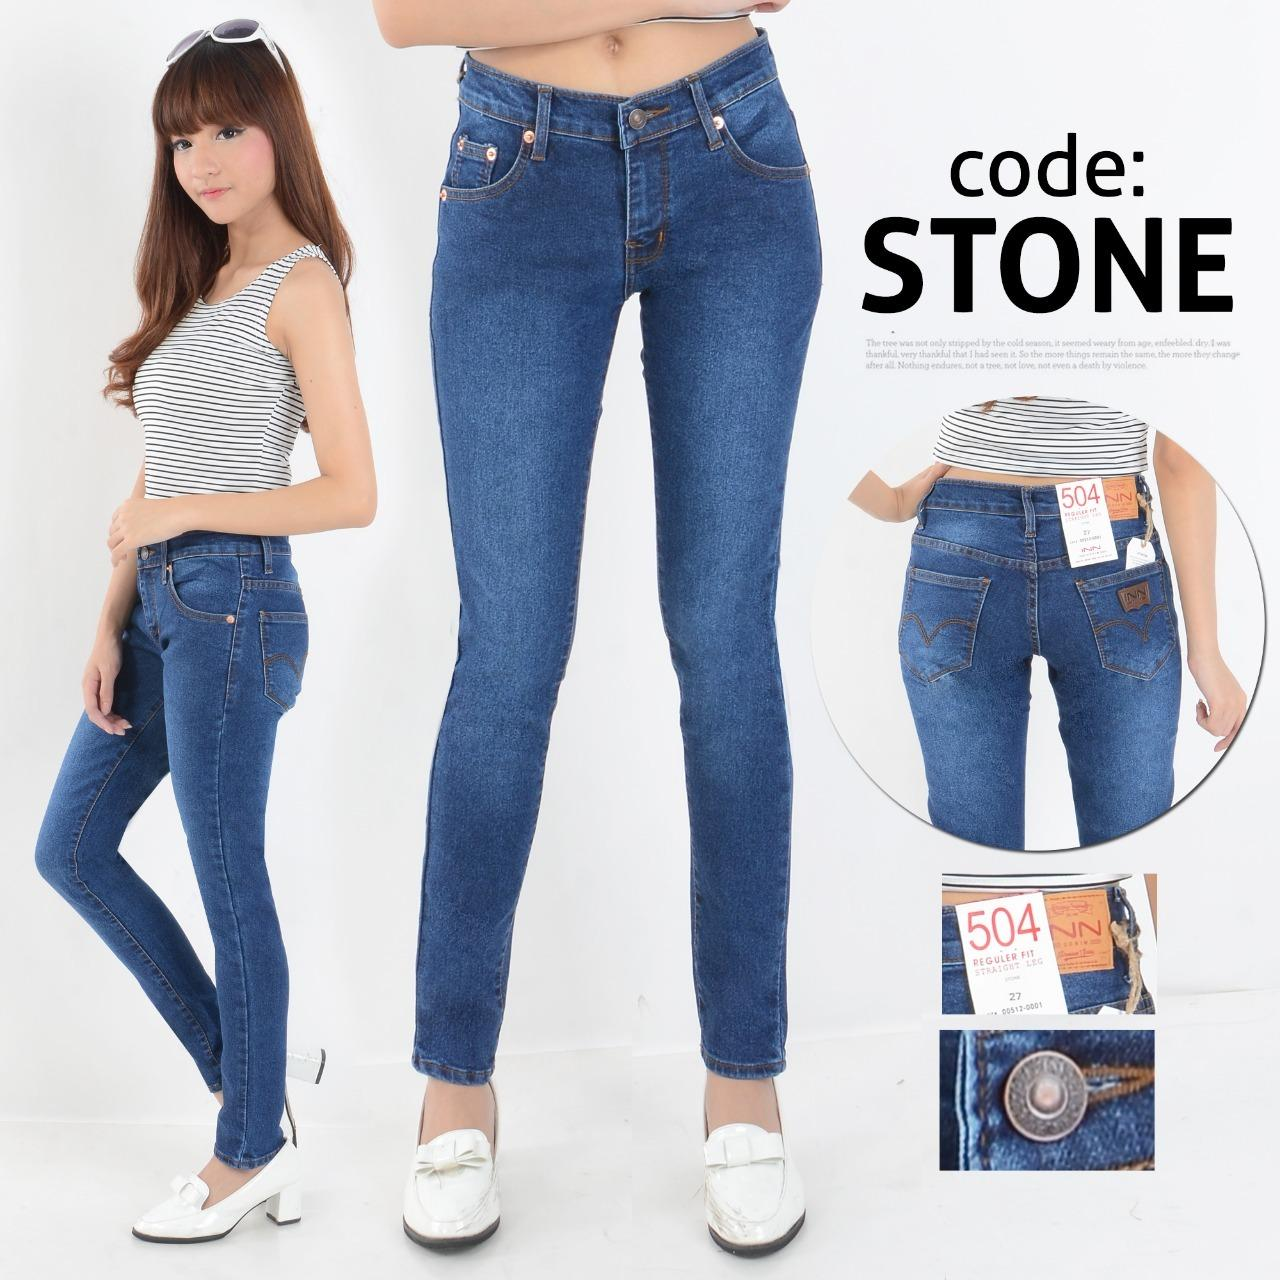 Celana Wanita Skinny Street Model Terbaru Berbahan Soft Jeans Bagus Murah  Jahitan Rapi e7fabd8668